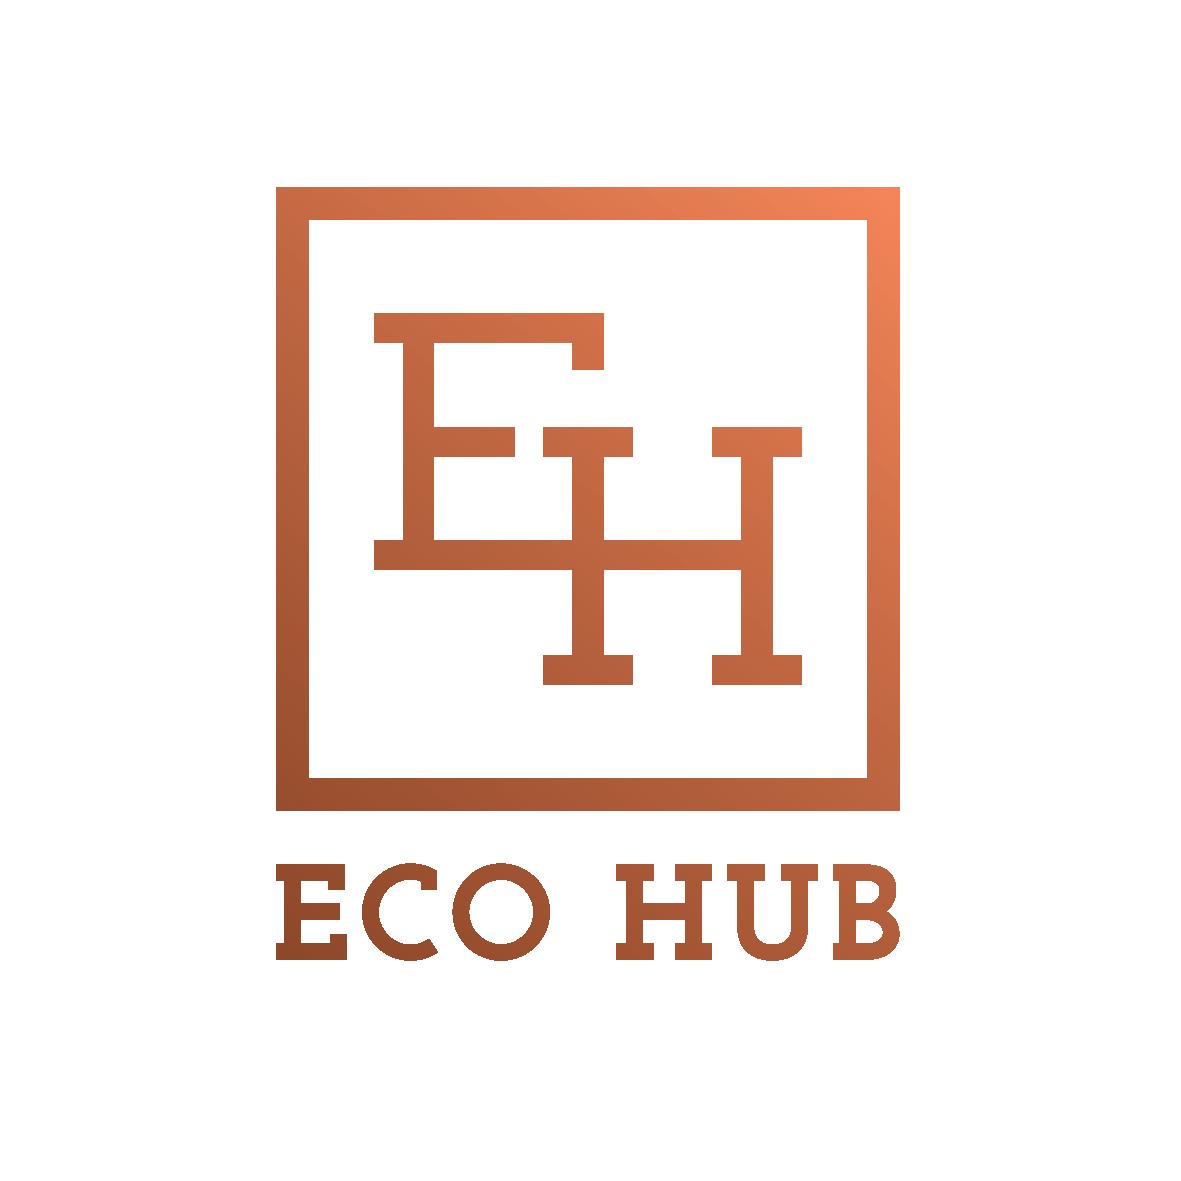 Eco Hub_final-01